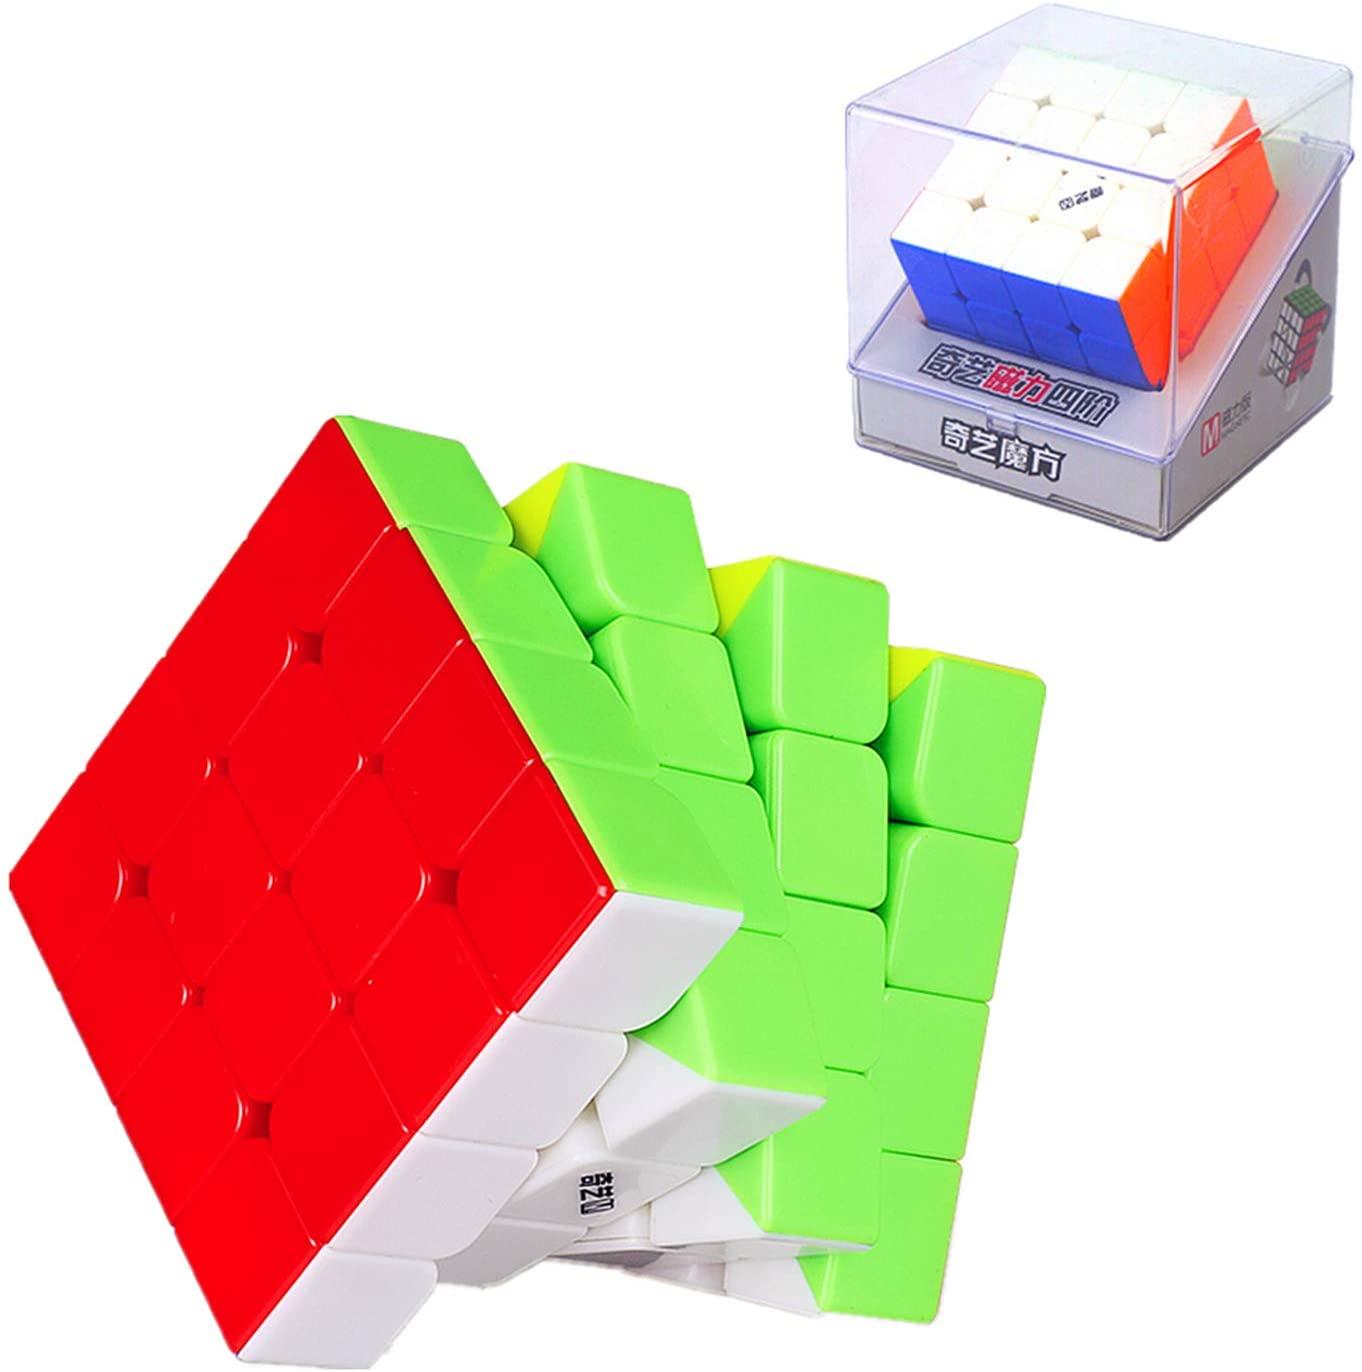 LiangCuber QiYi MS Series 4x4 Magnetic Speed Cube Stickerless Qiyi 4x4x4 m Speedcube Puzzle(2020 Newest Version)